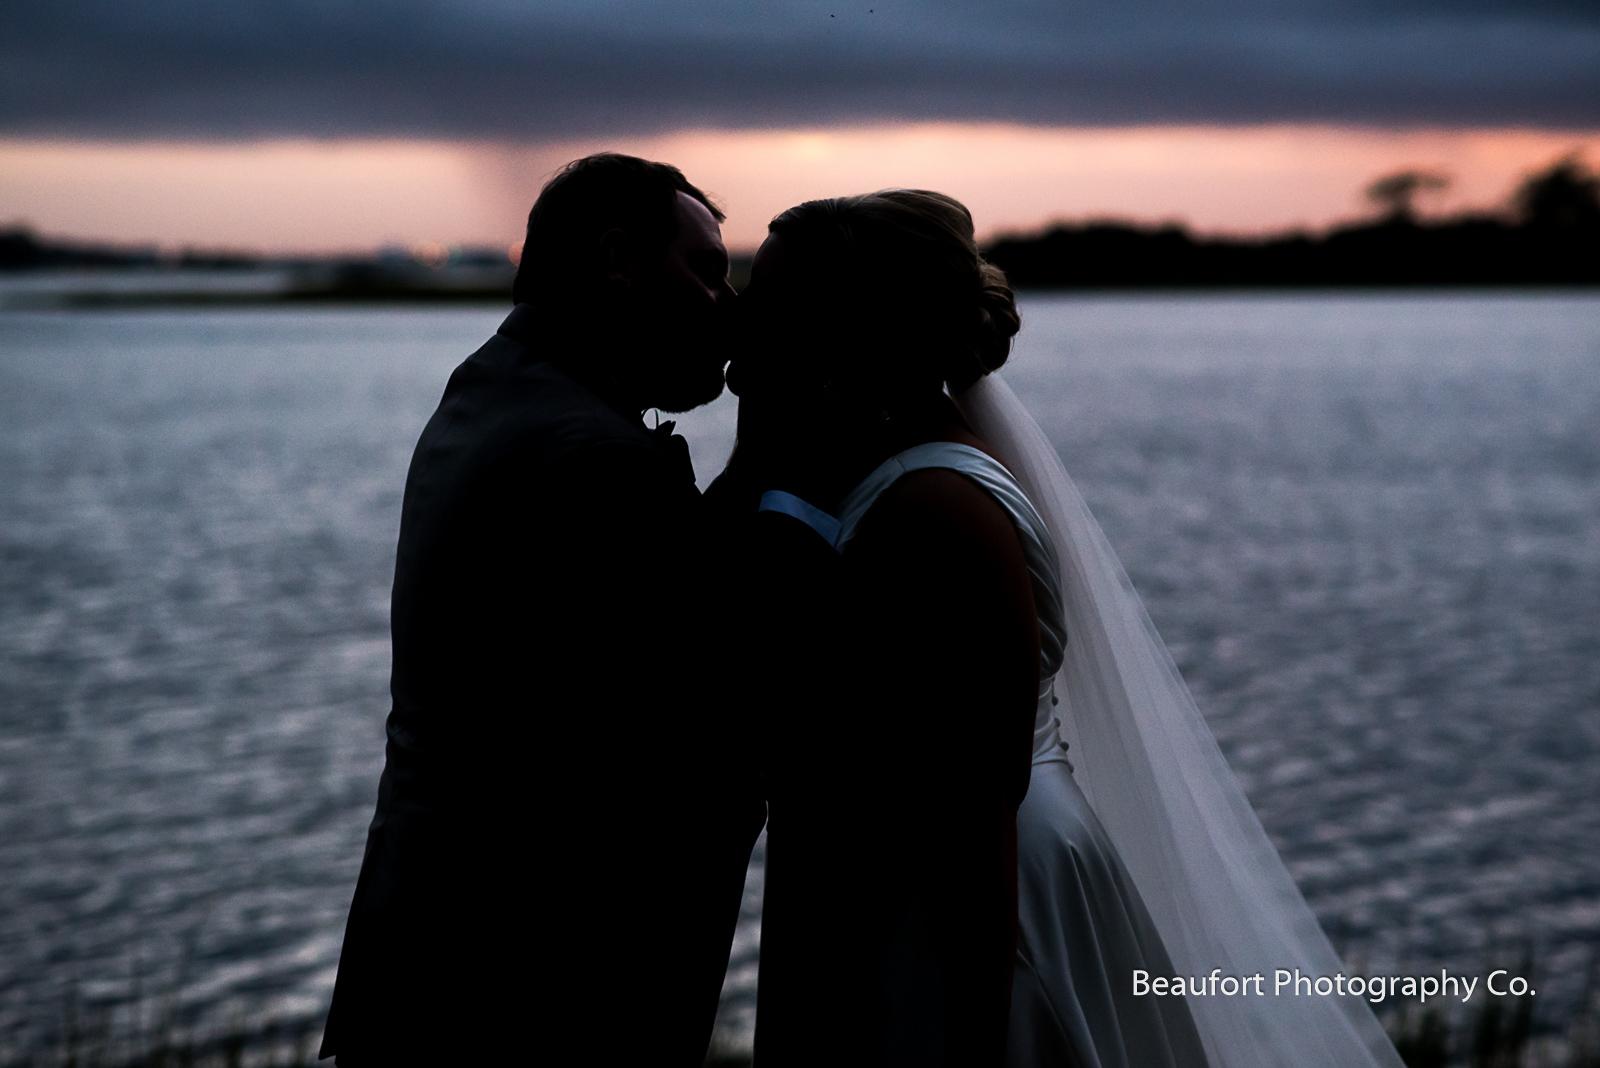 Beaufort Photography Co. Cedar Point